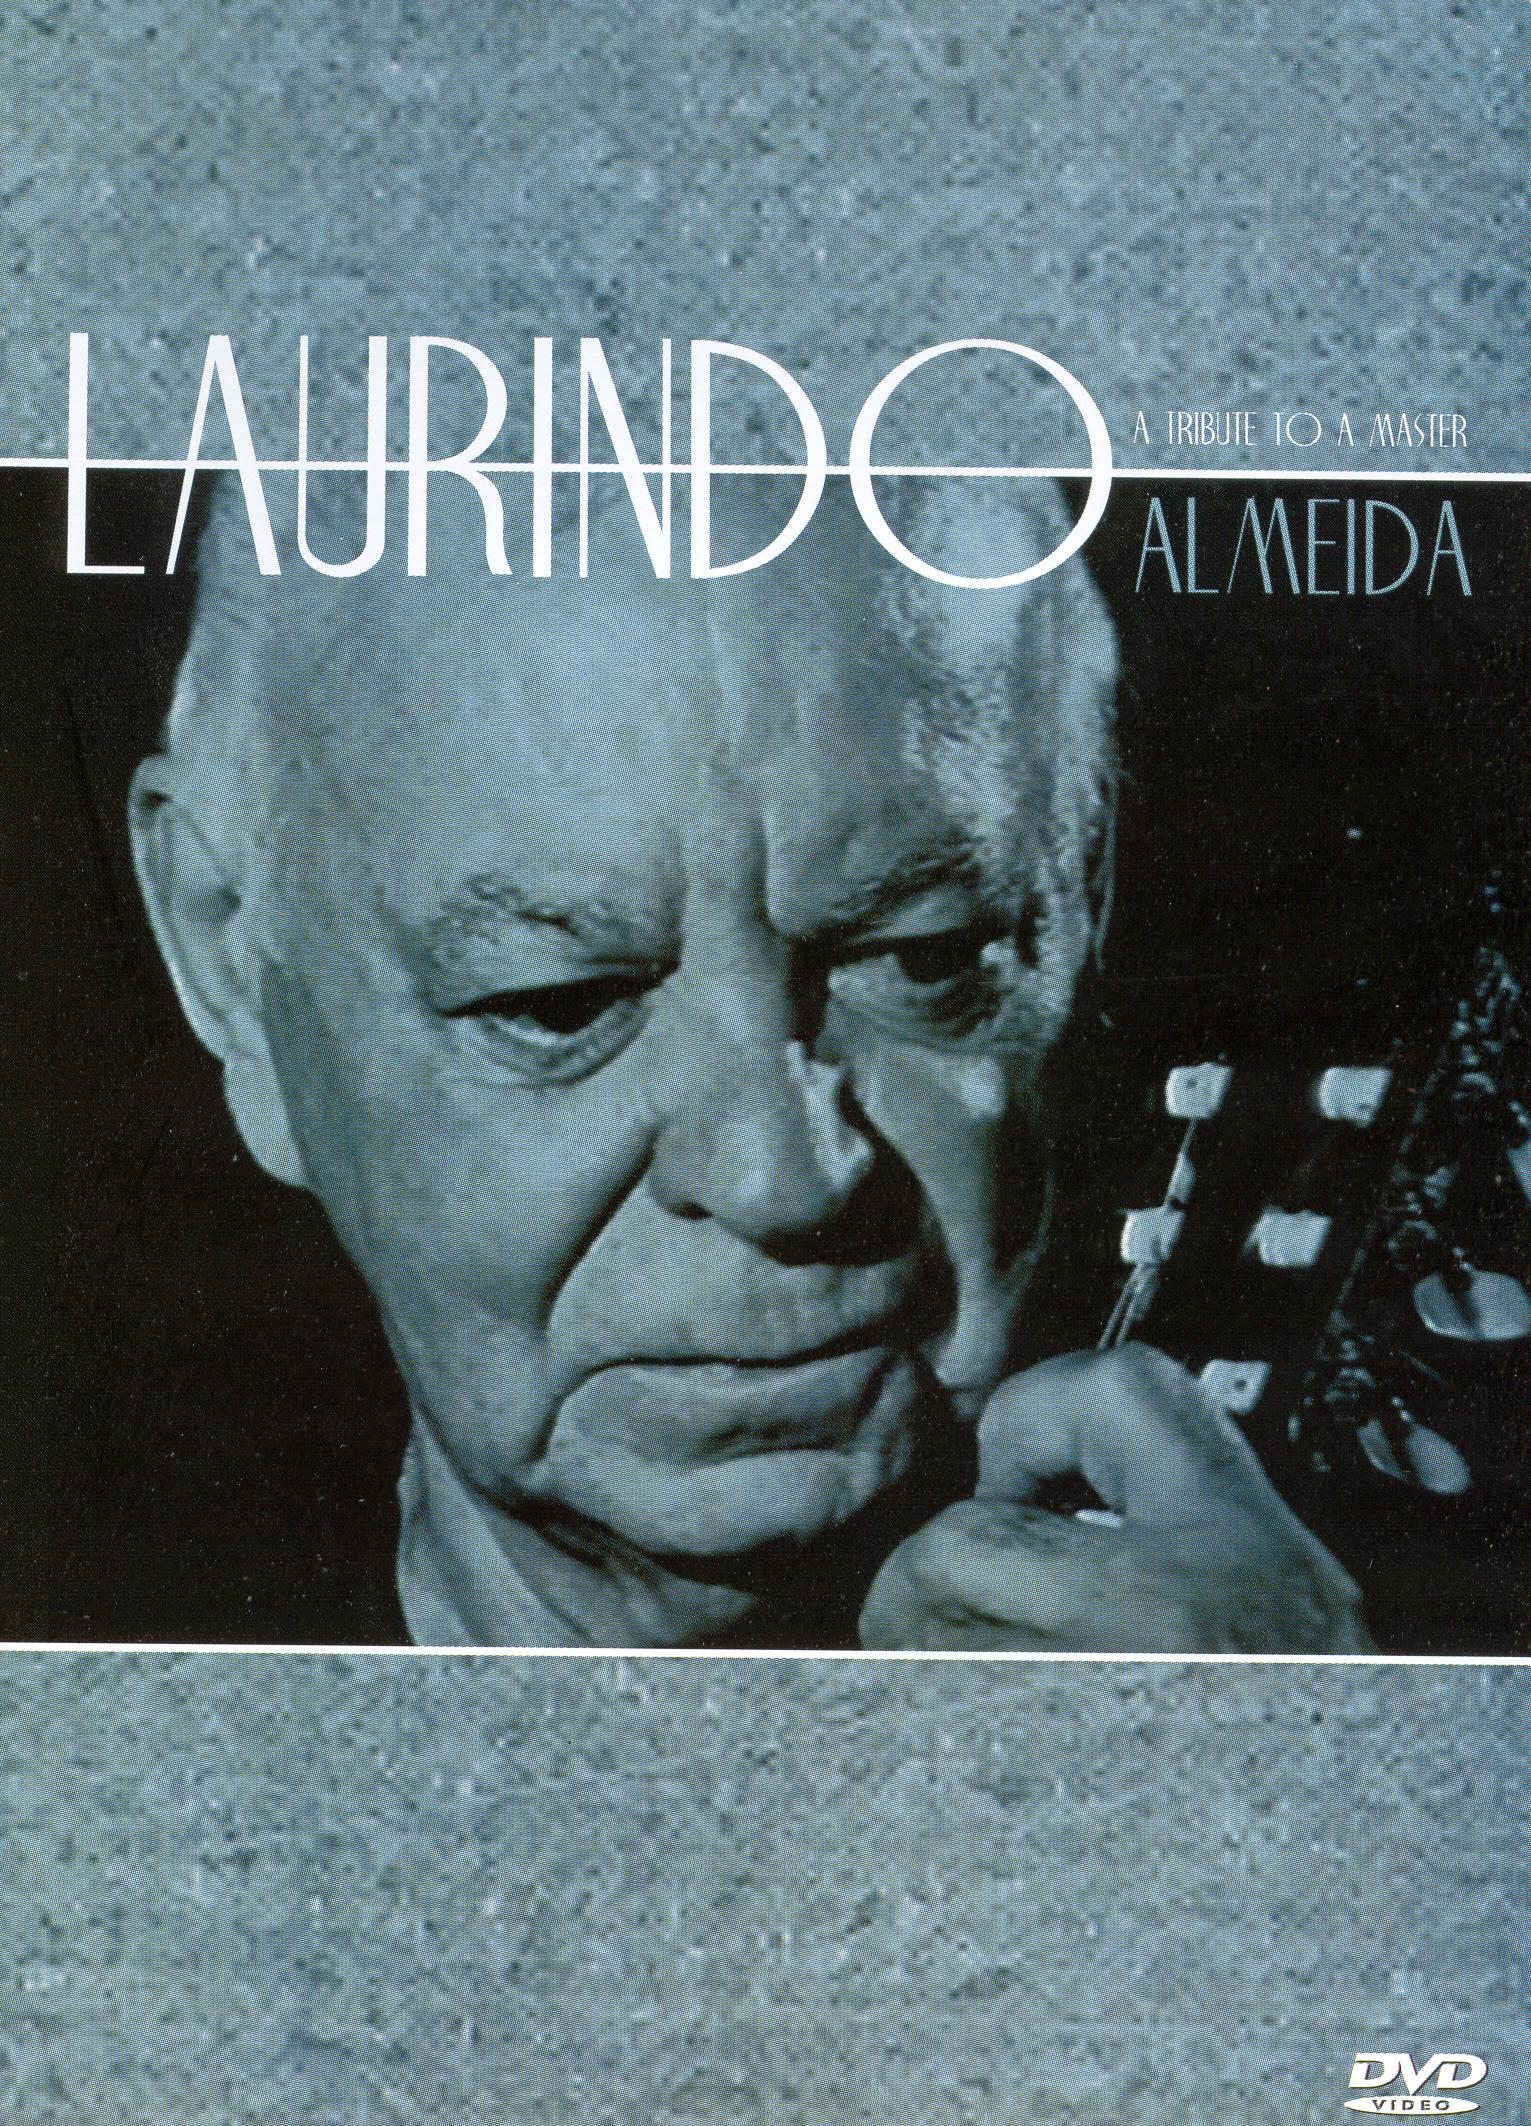 Laurindo Almeida: A Tribute to a Master